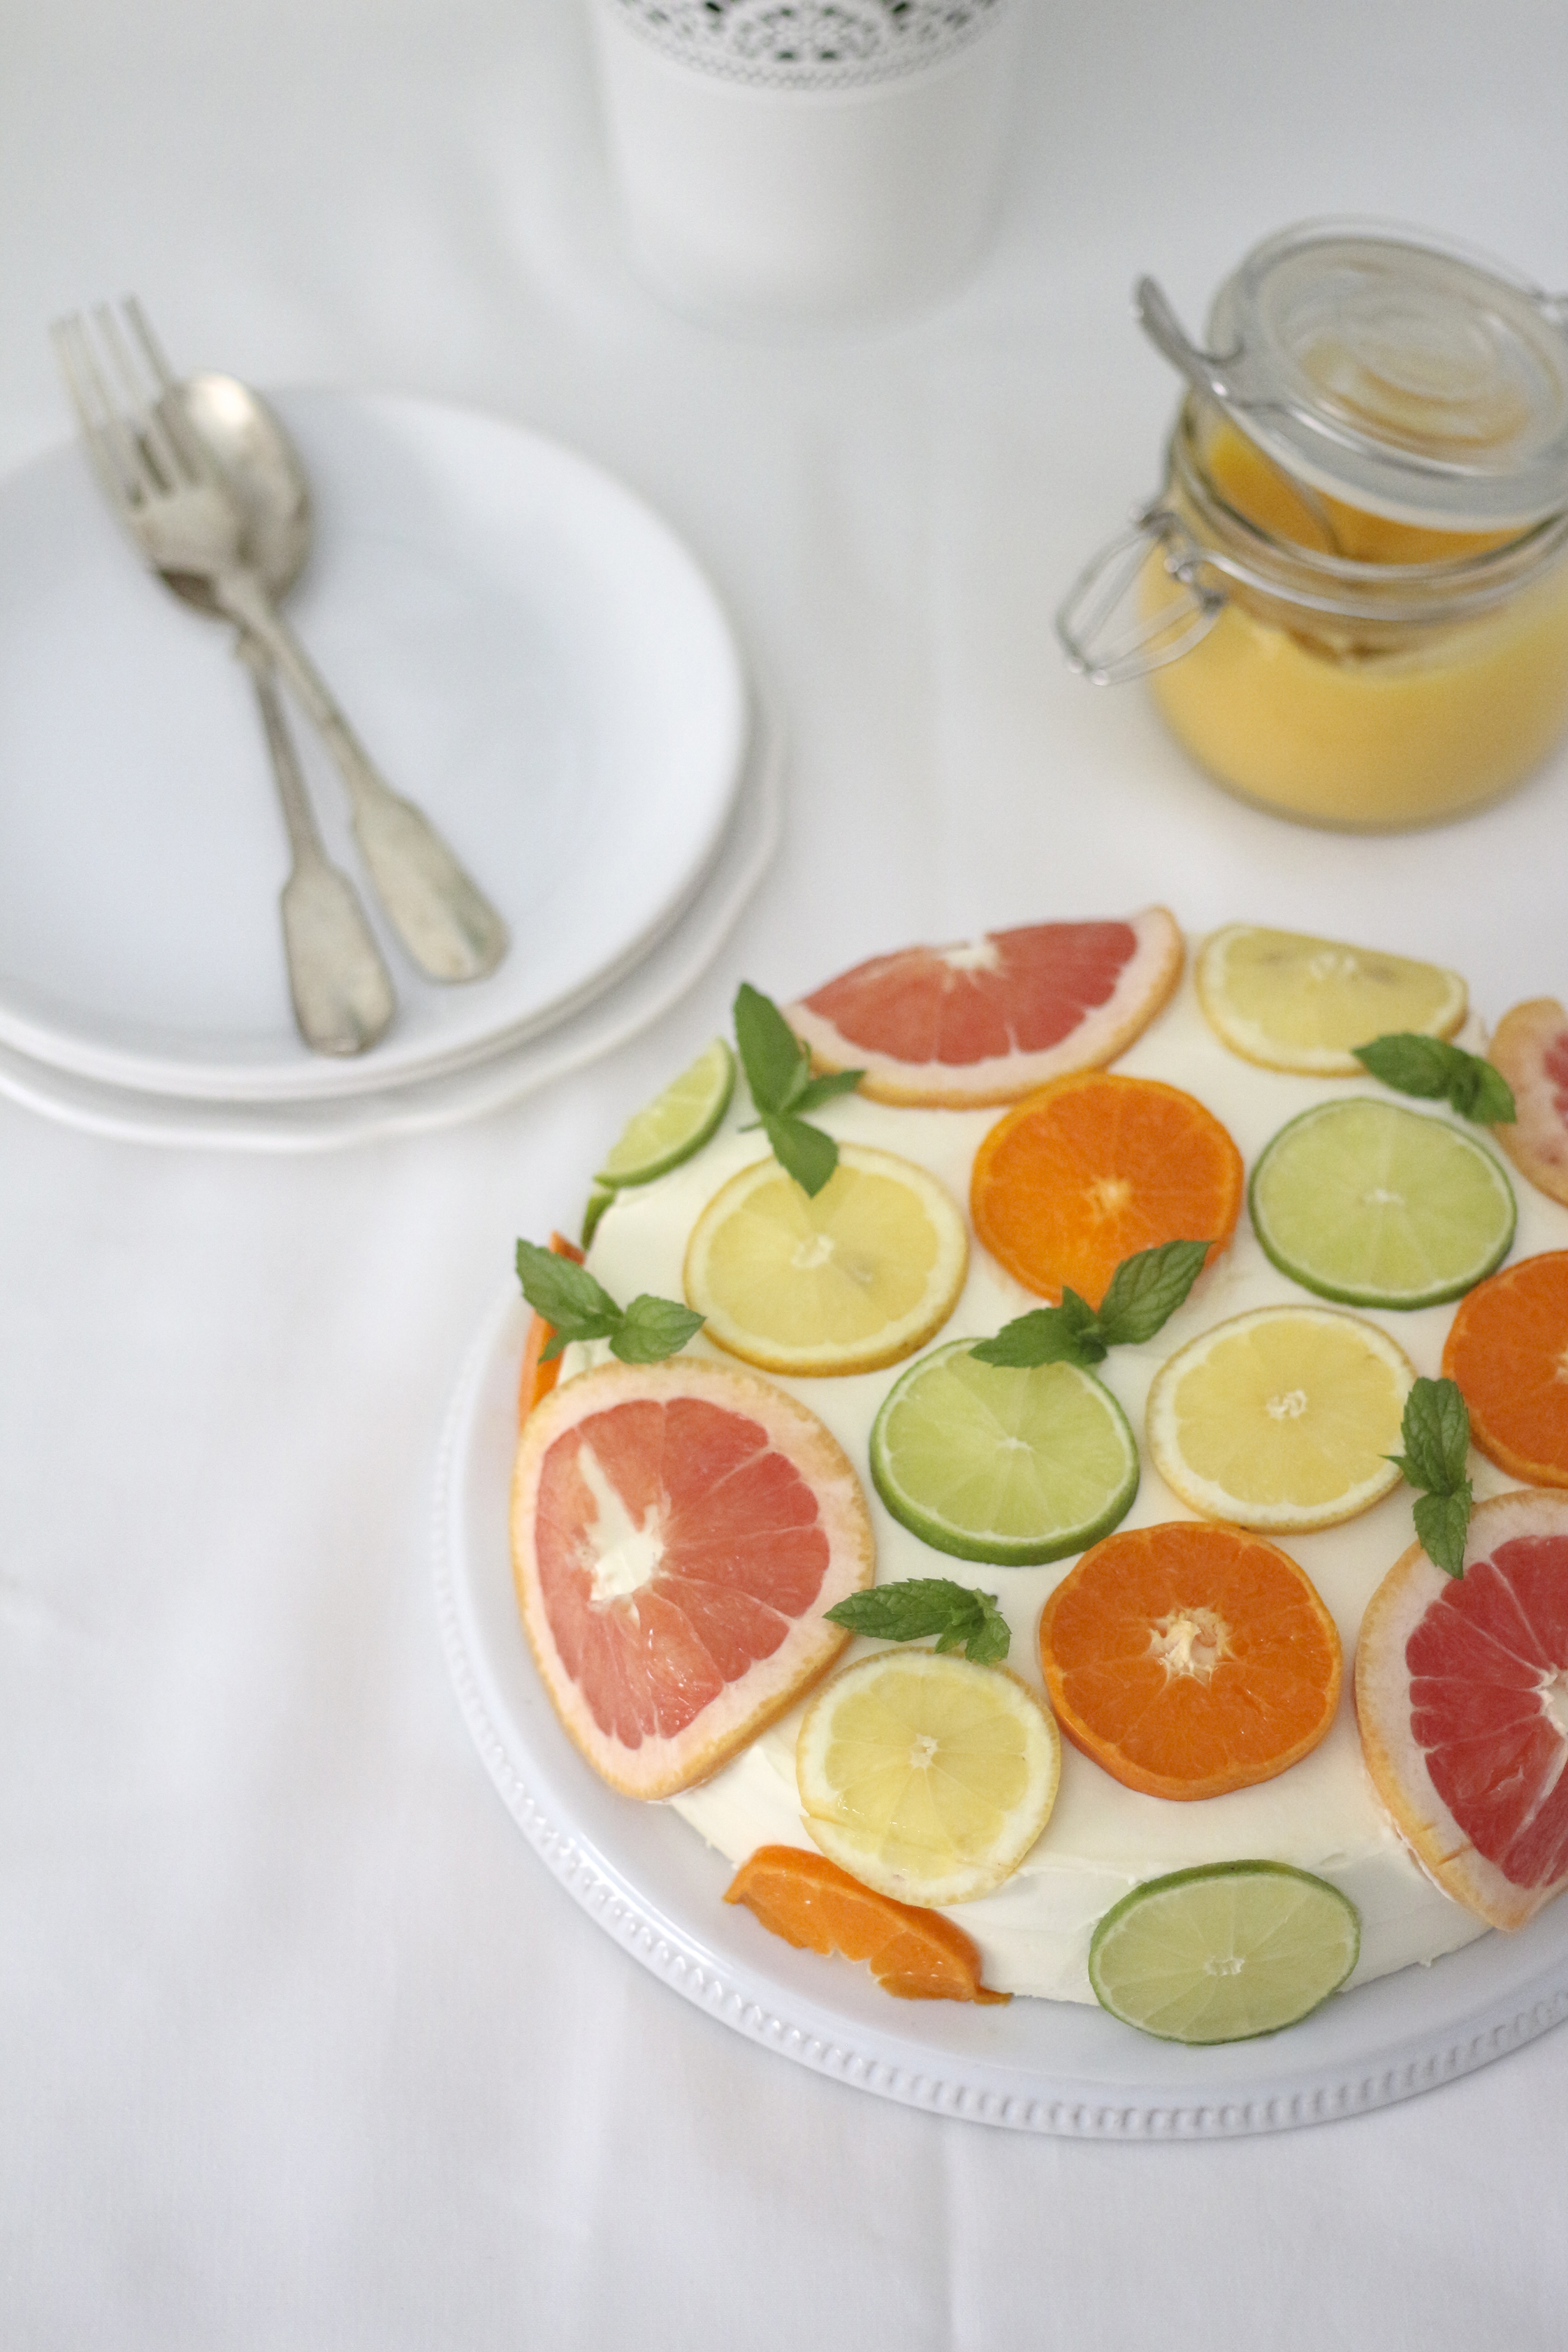 Coconut Cake with Citrus2